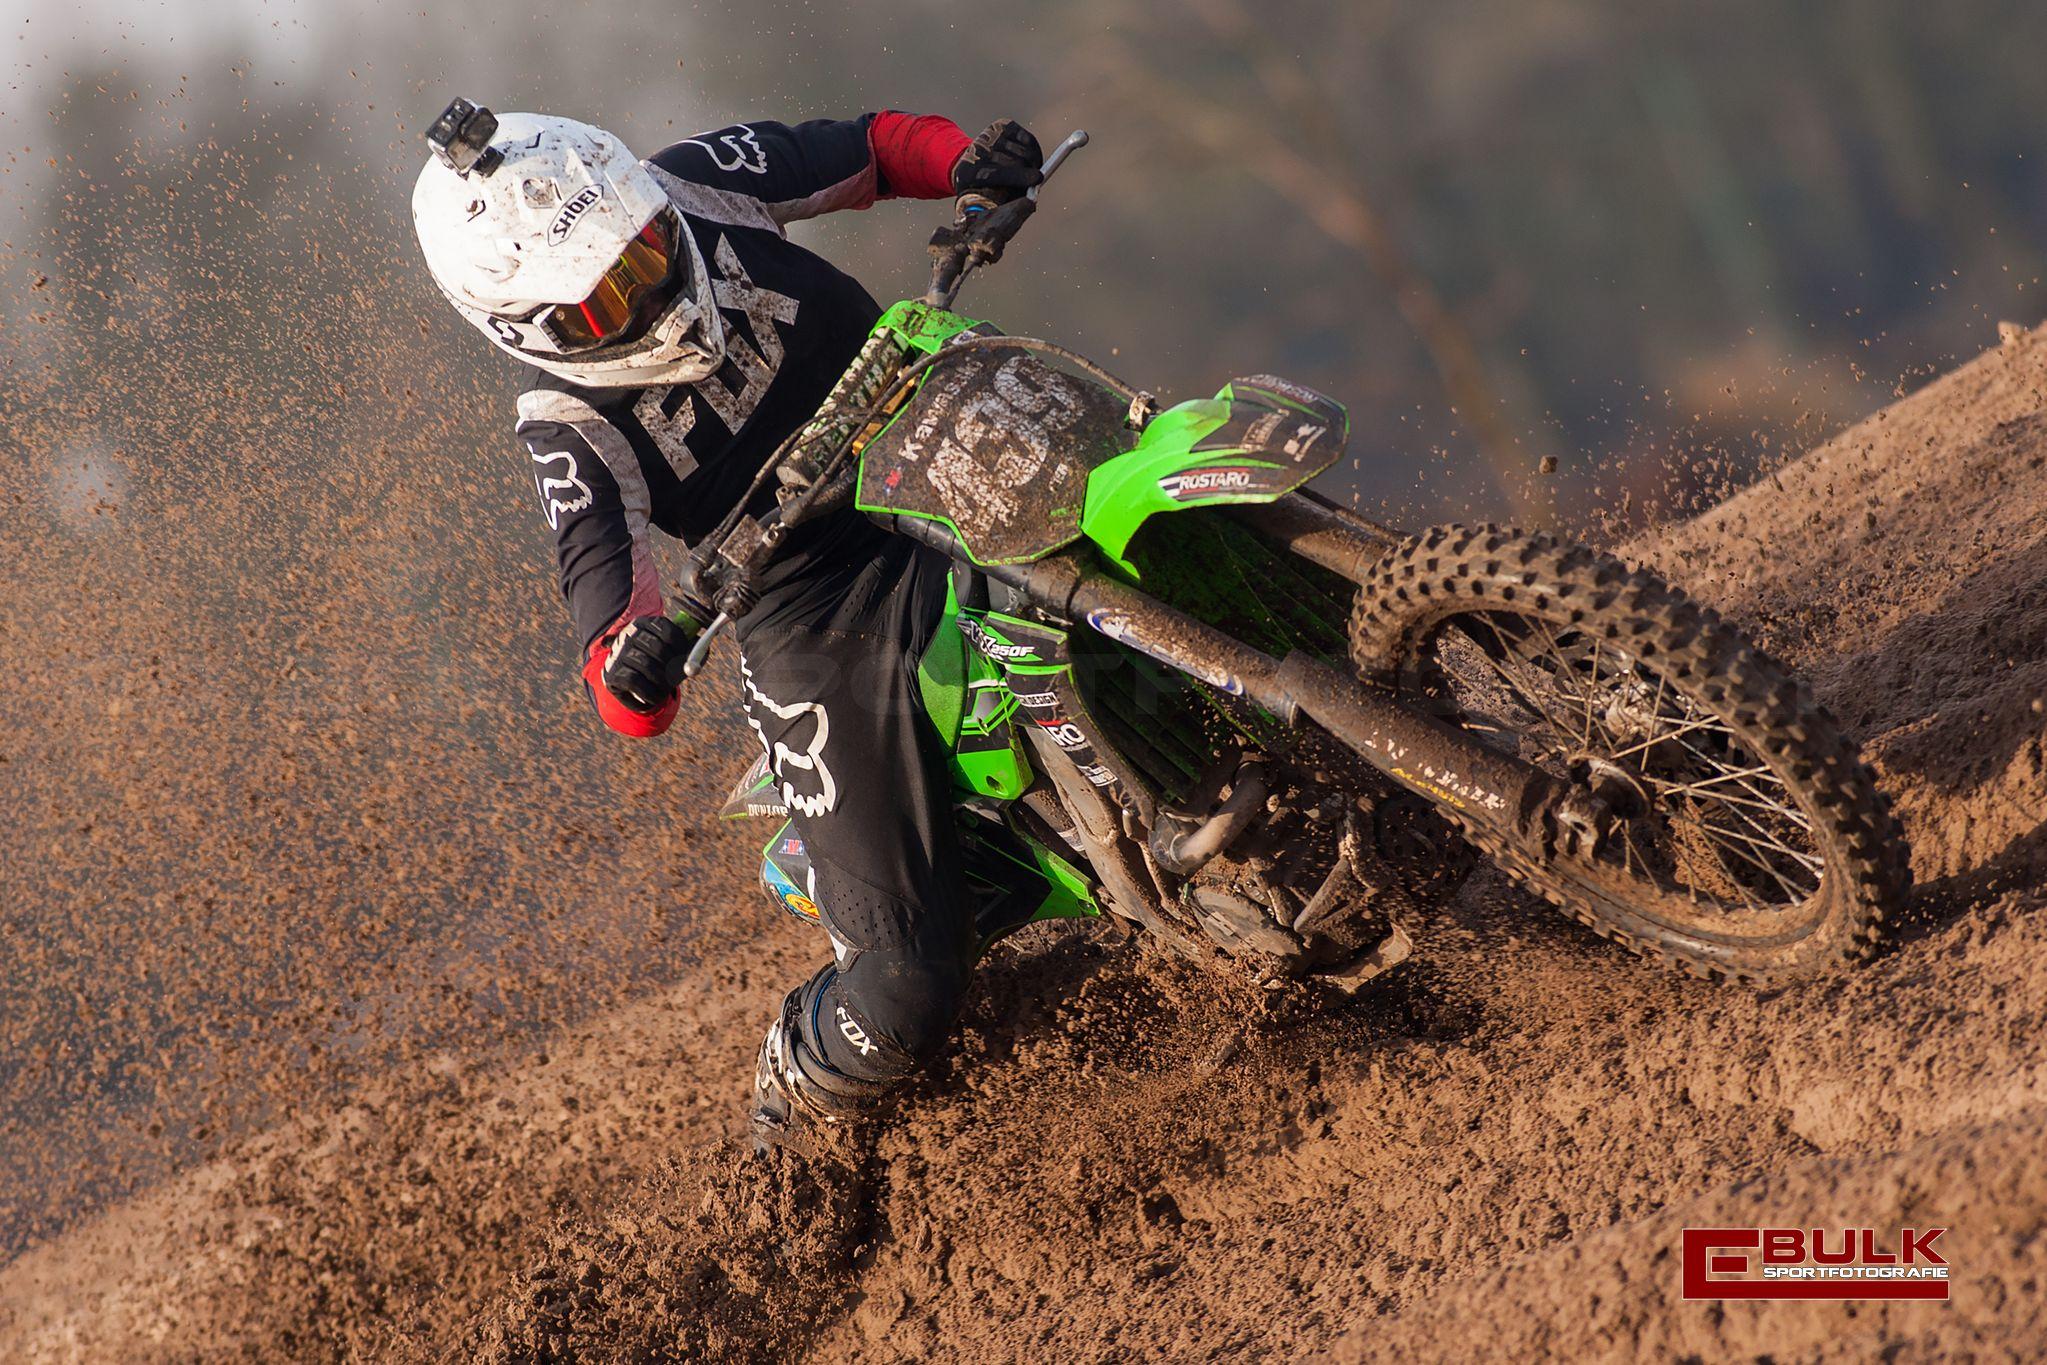 ebs_0325-ed_bulk_sportfotografie